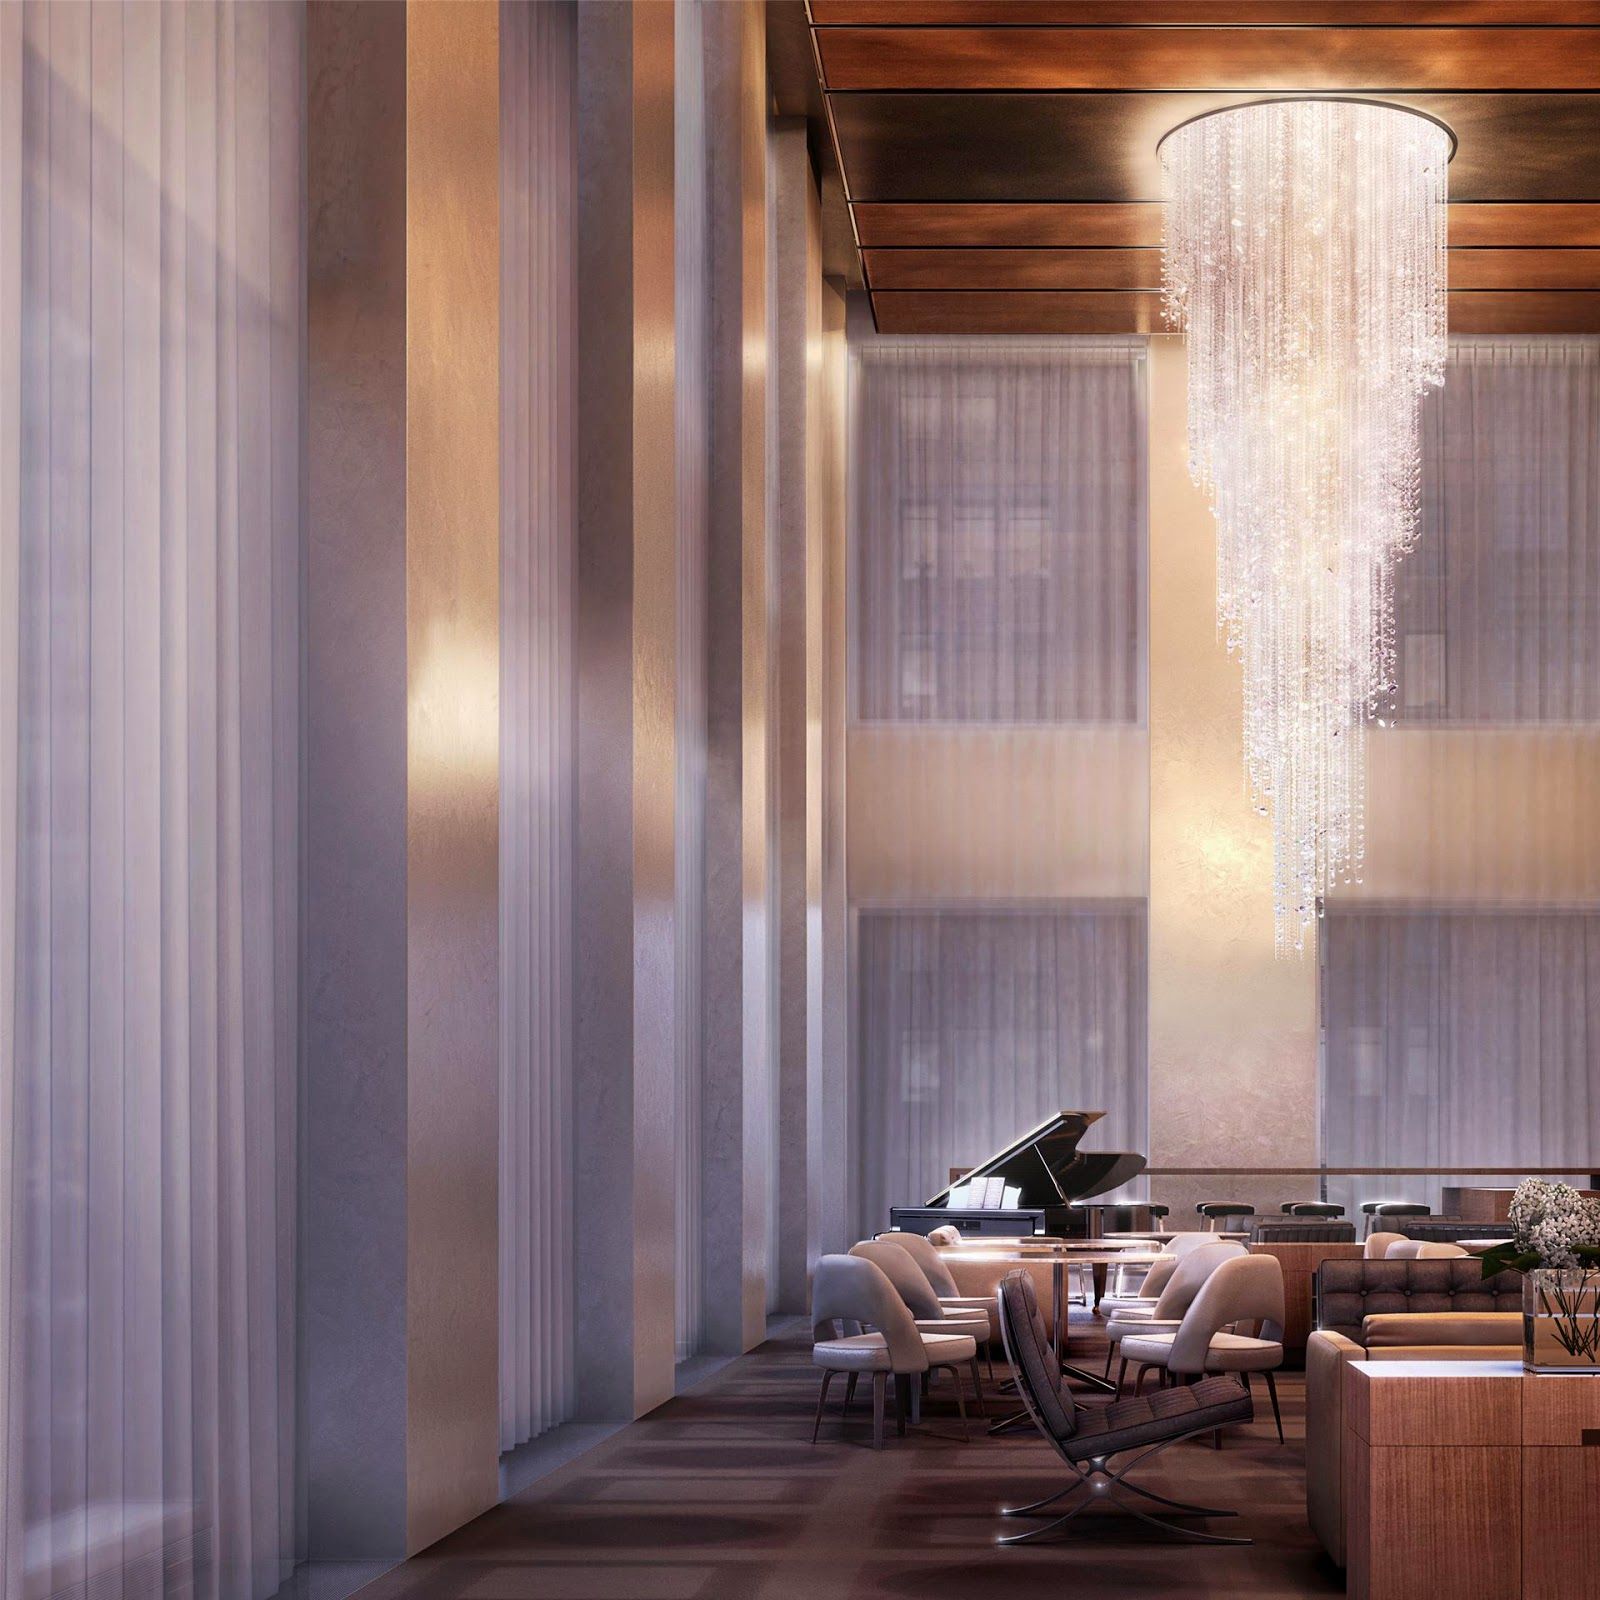 Park Avenue New York Apartments: Passion For Luxury : Glorious 432 Park Avenue Skyscraper